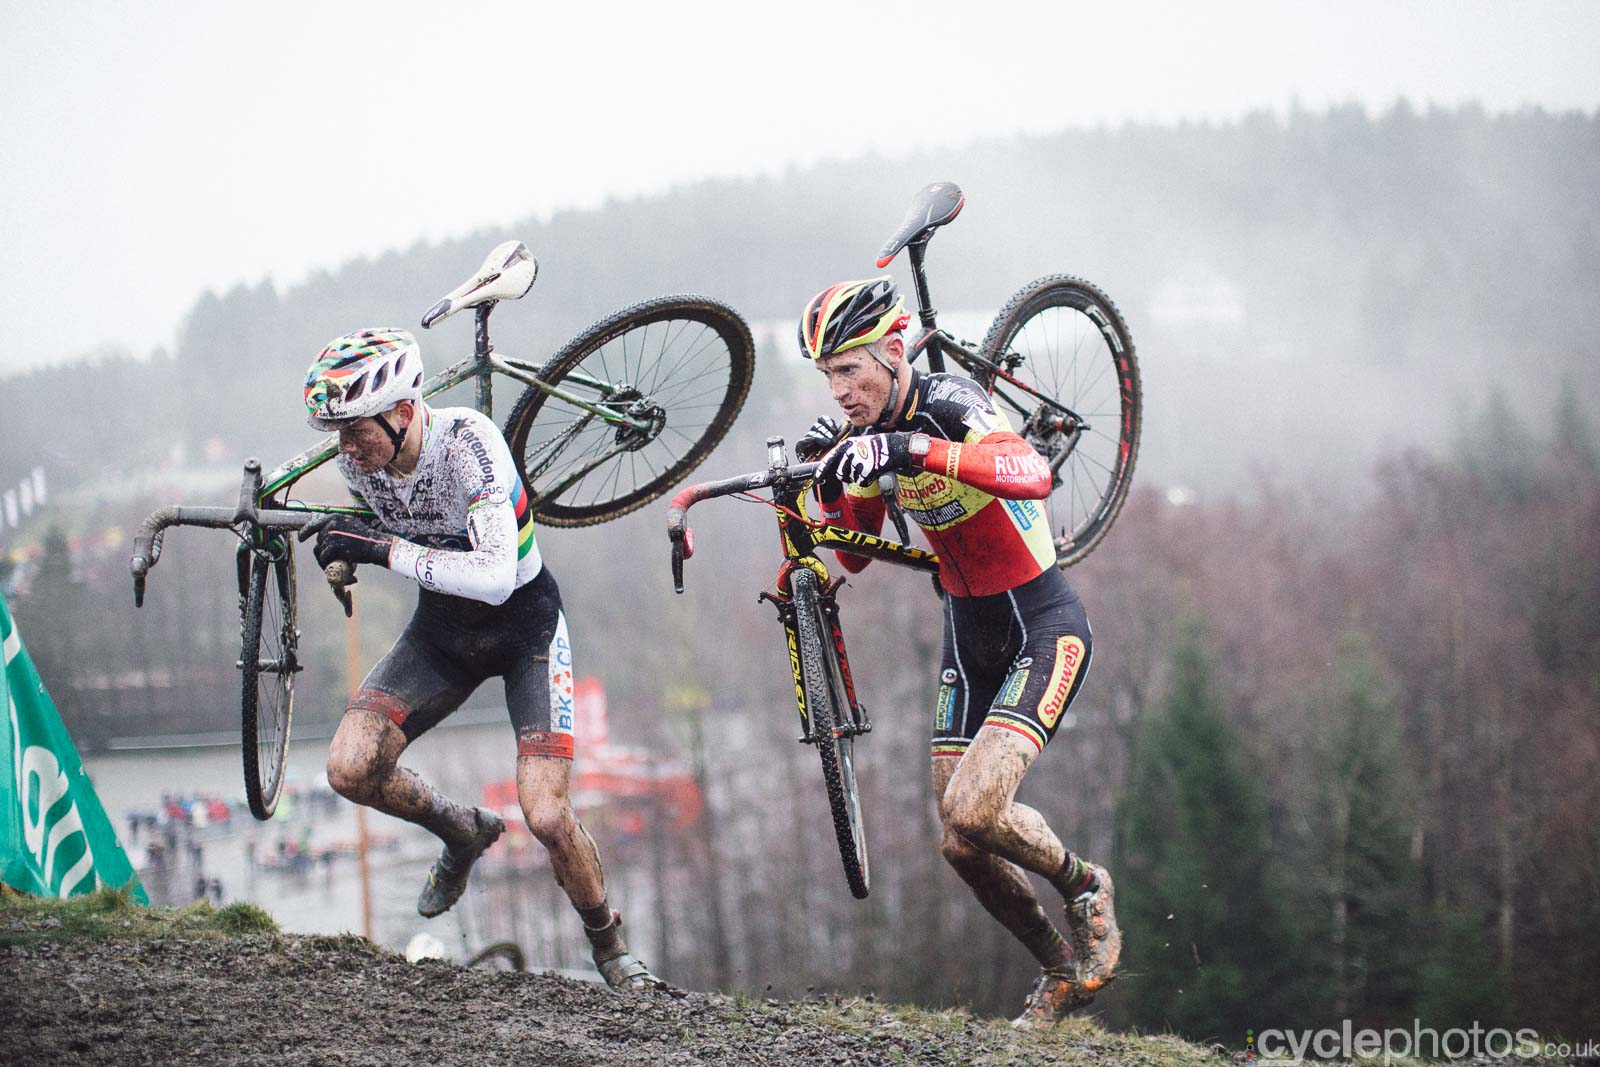 2015-cyclephotos-cyclocross-spa-151208-mathieu-van-der-poel